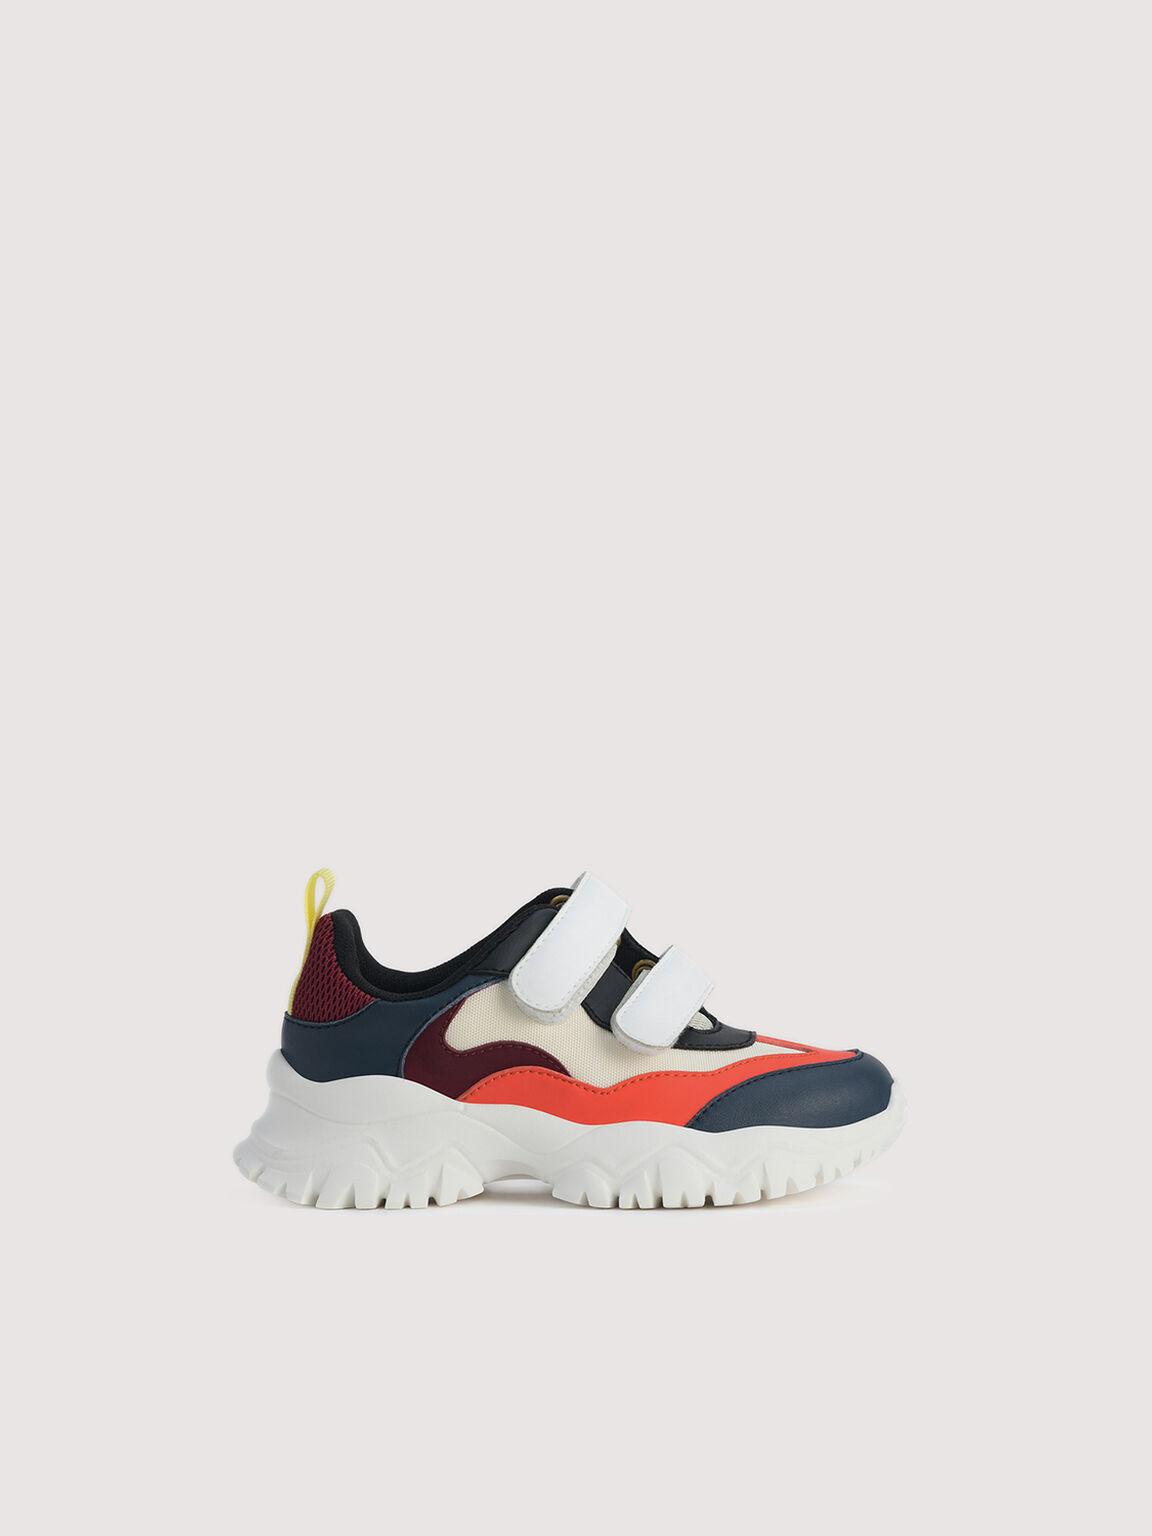 Colourblock Sneakers, Multi2, hi-res